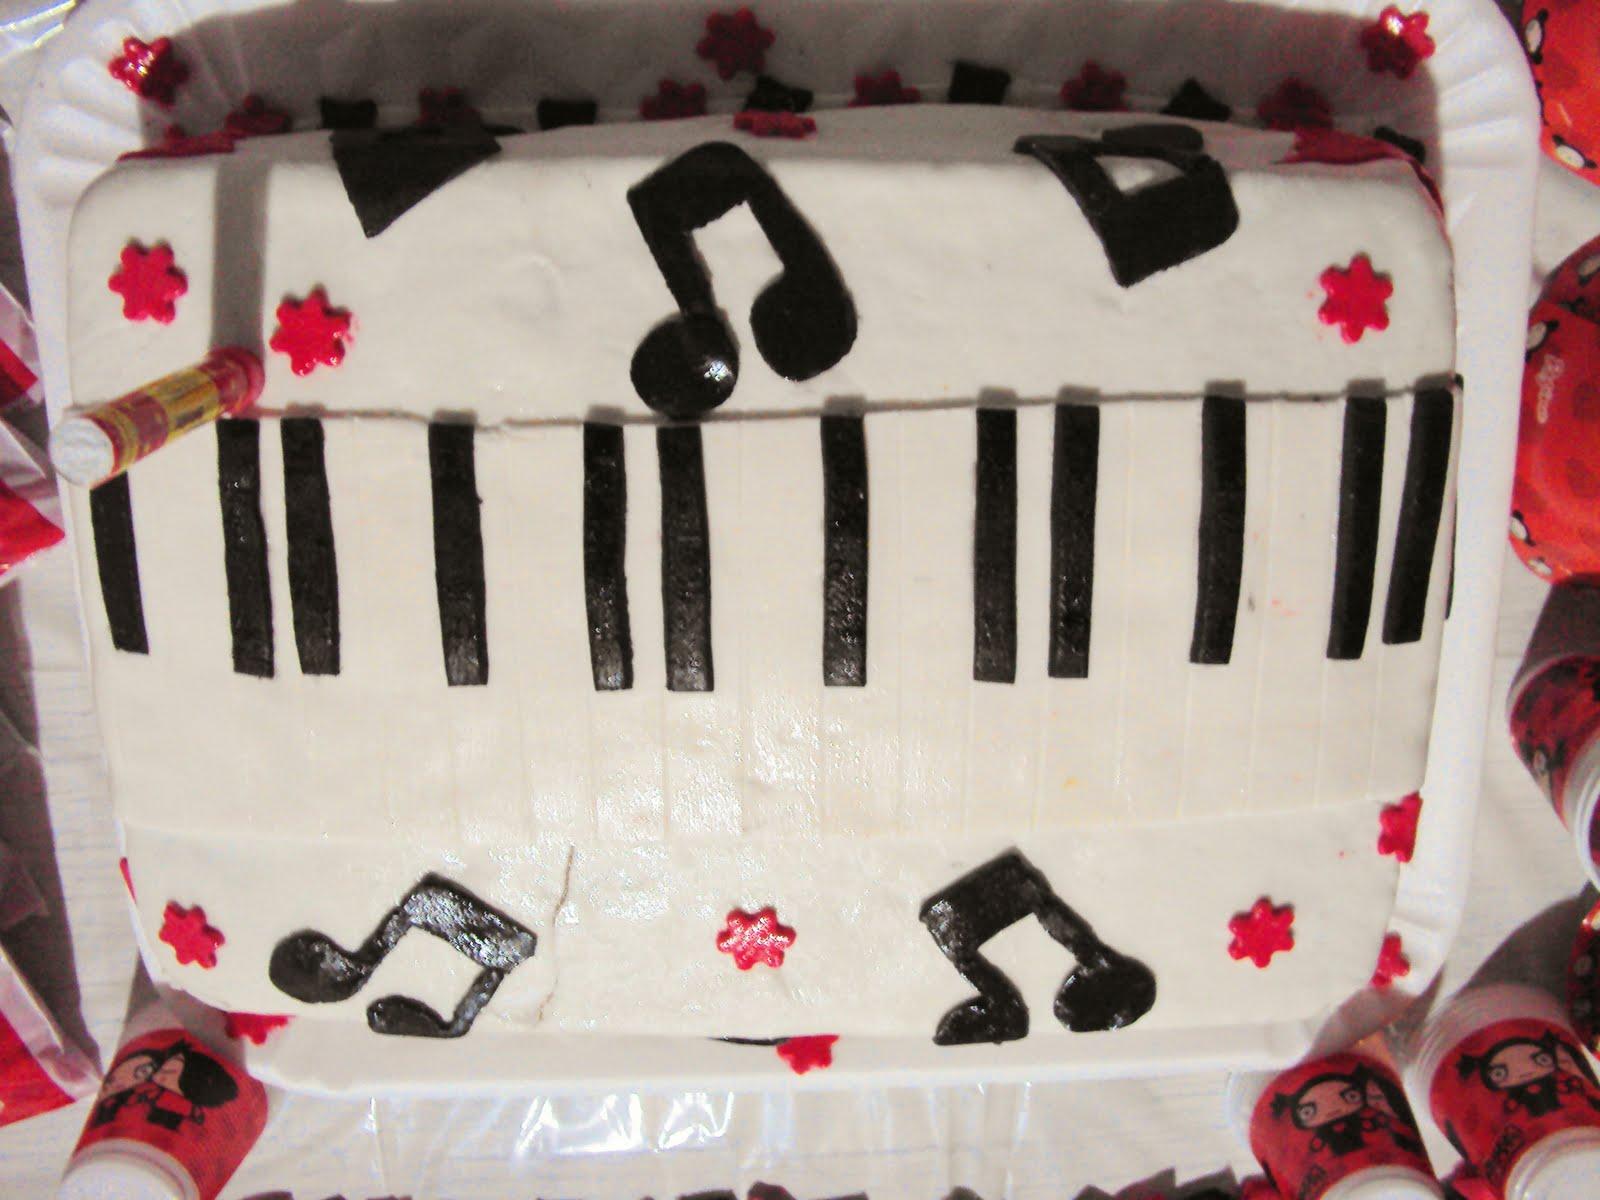 Bolo De Notas Musicais Bolo De Notas Musicais   Pasta Americana